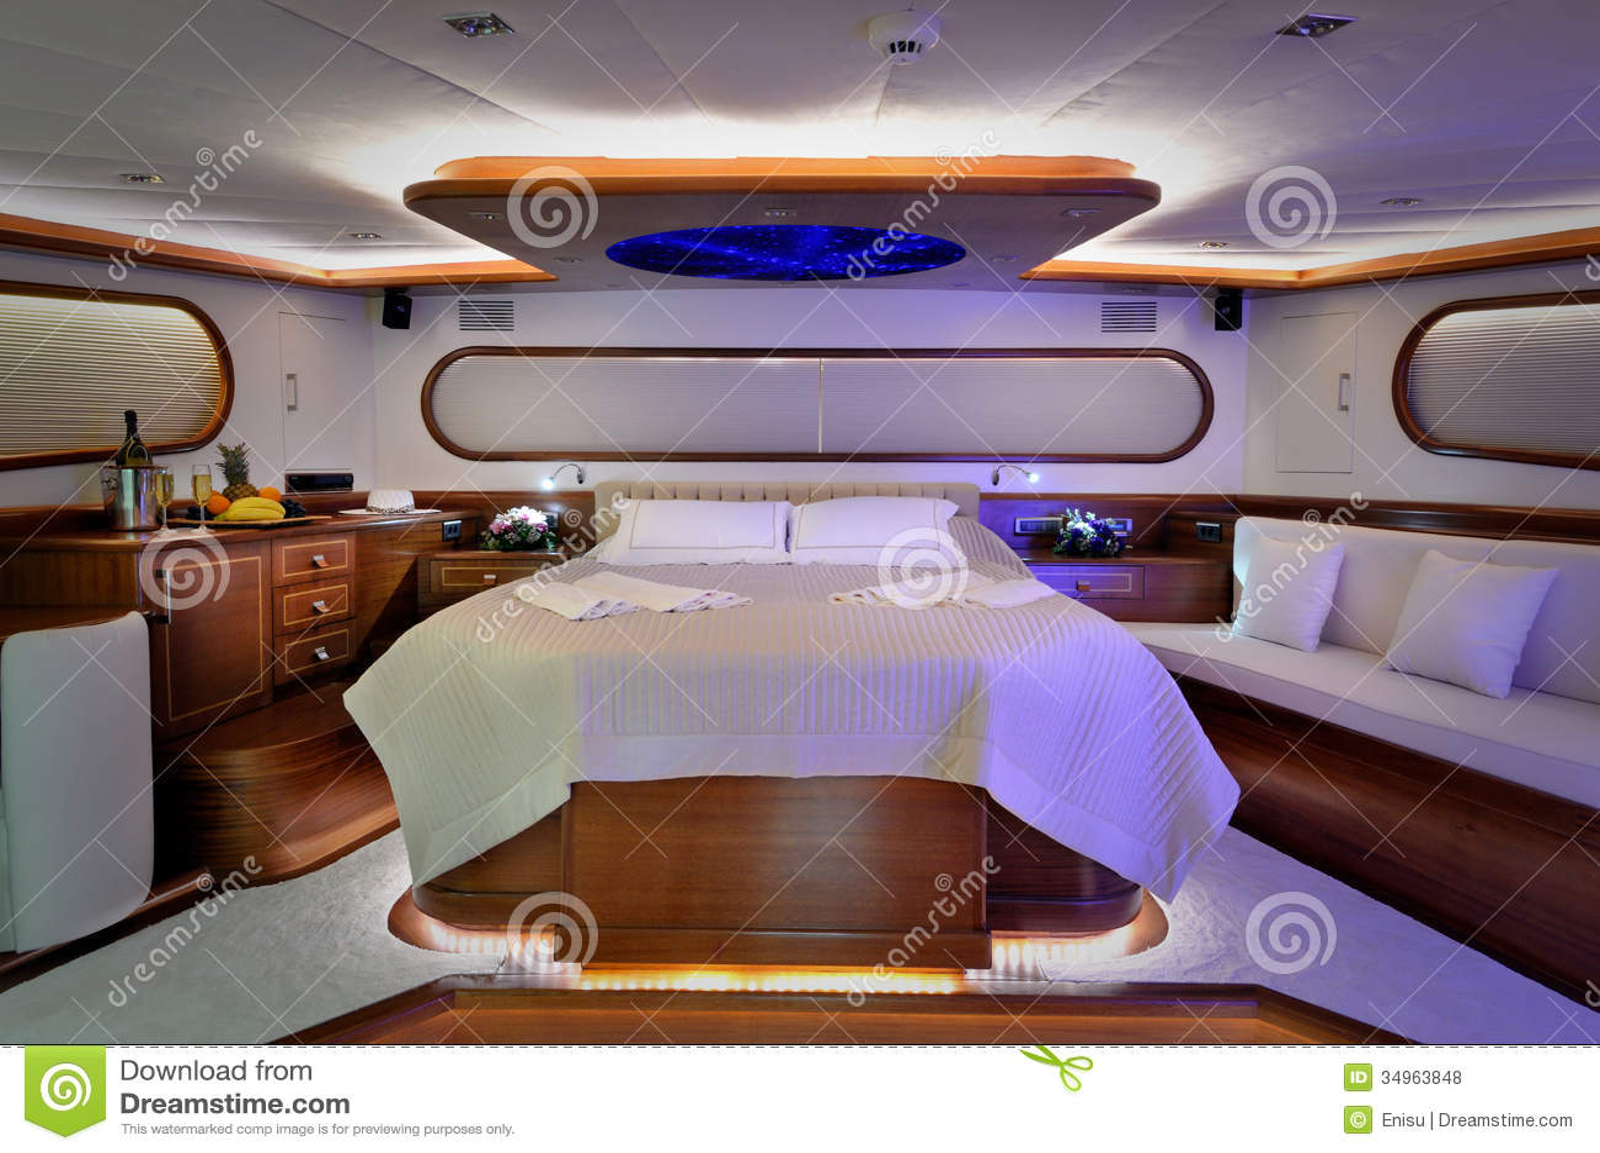 Bedroom Of Sailboat Stock Photo Image Of Sailboat Decoration 34963848